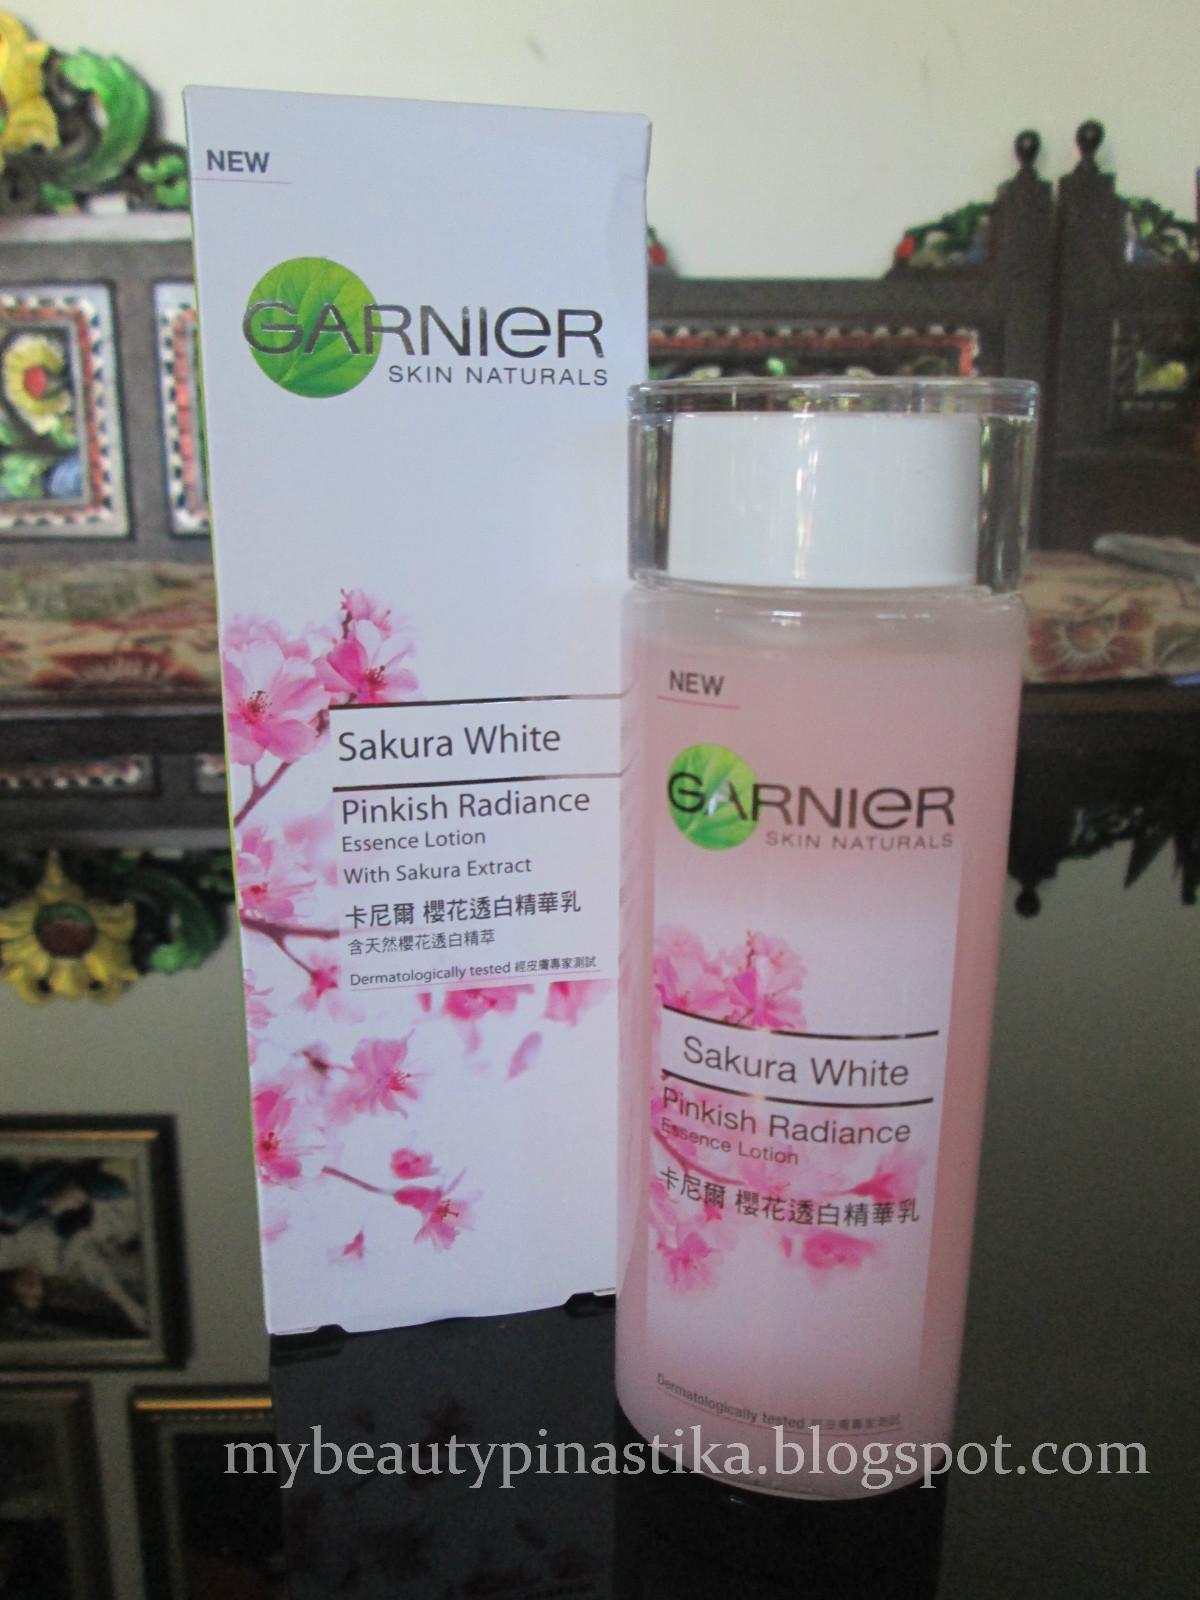 Pinastika Beauty Blog Review Garnier Sakura White Pinkish 18ml Spf21 Saturday September 7 2013